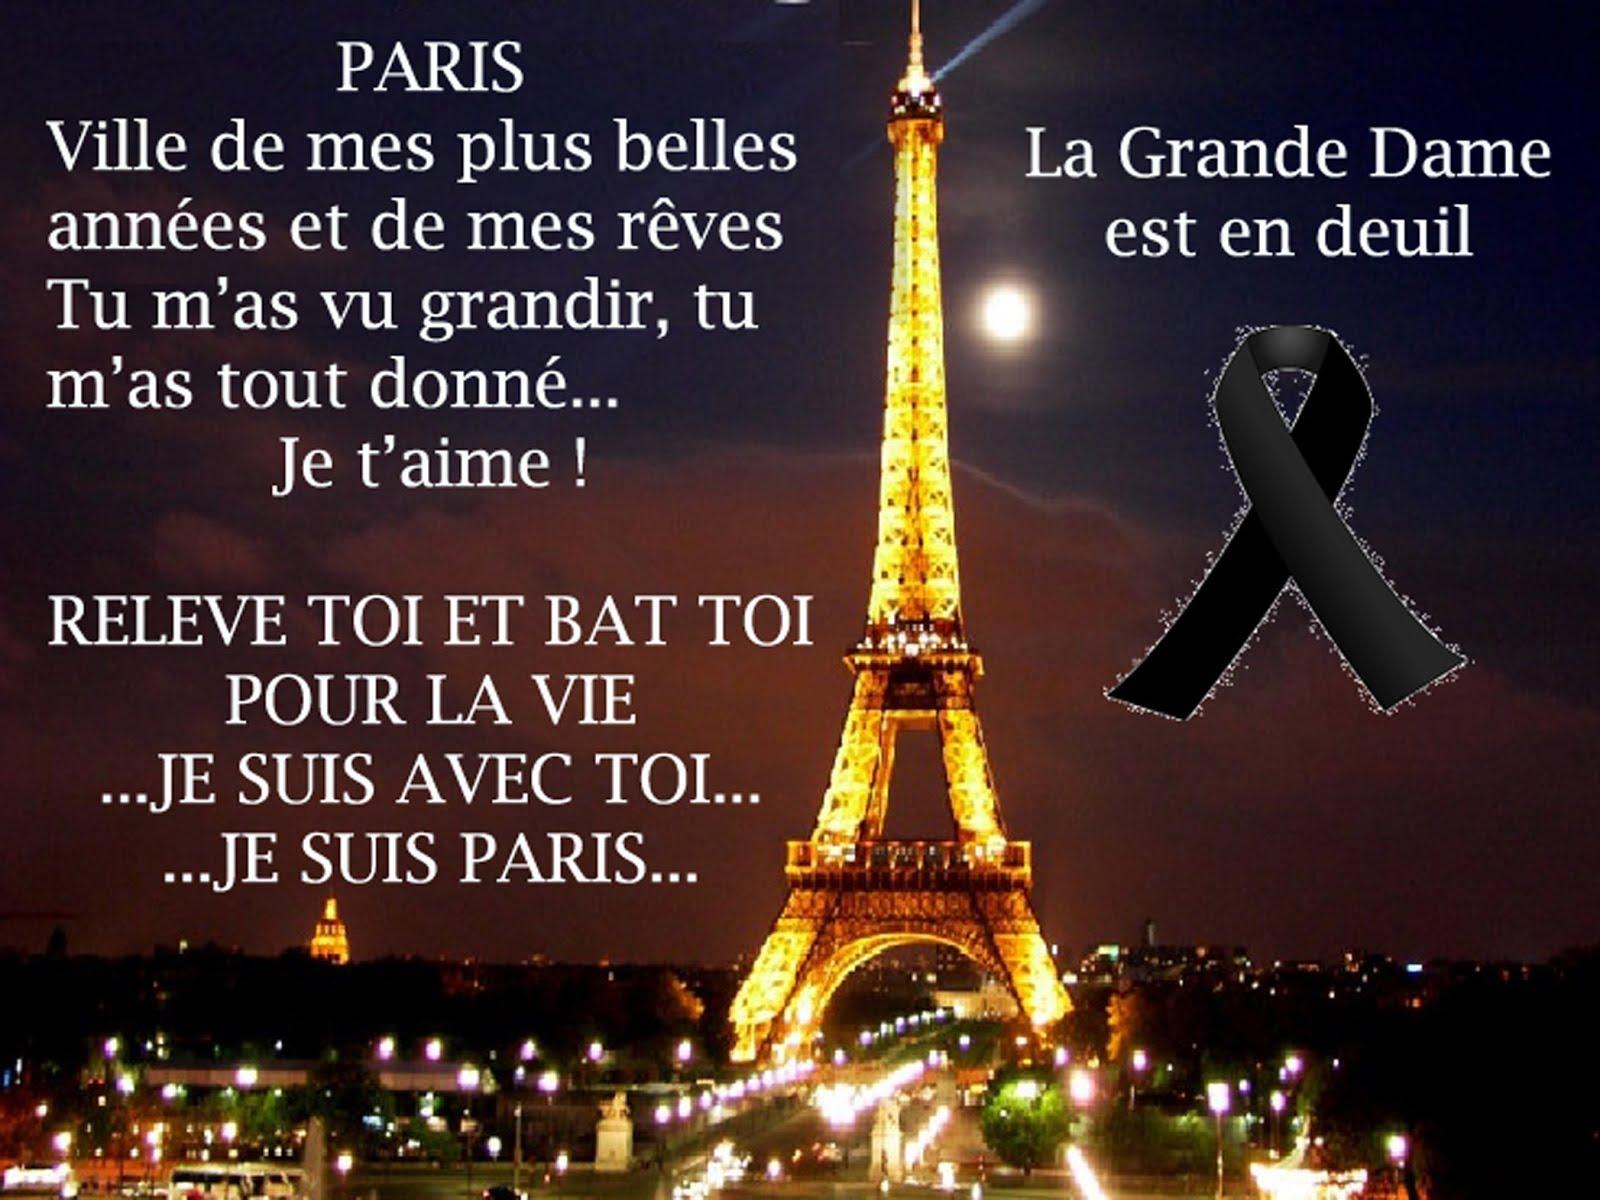 LA GRANDE DAME DE FER EN DEUIL - JE SUIS PARIS